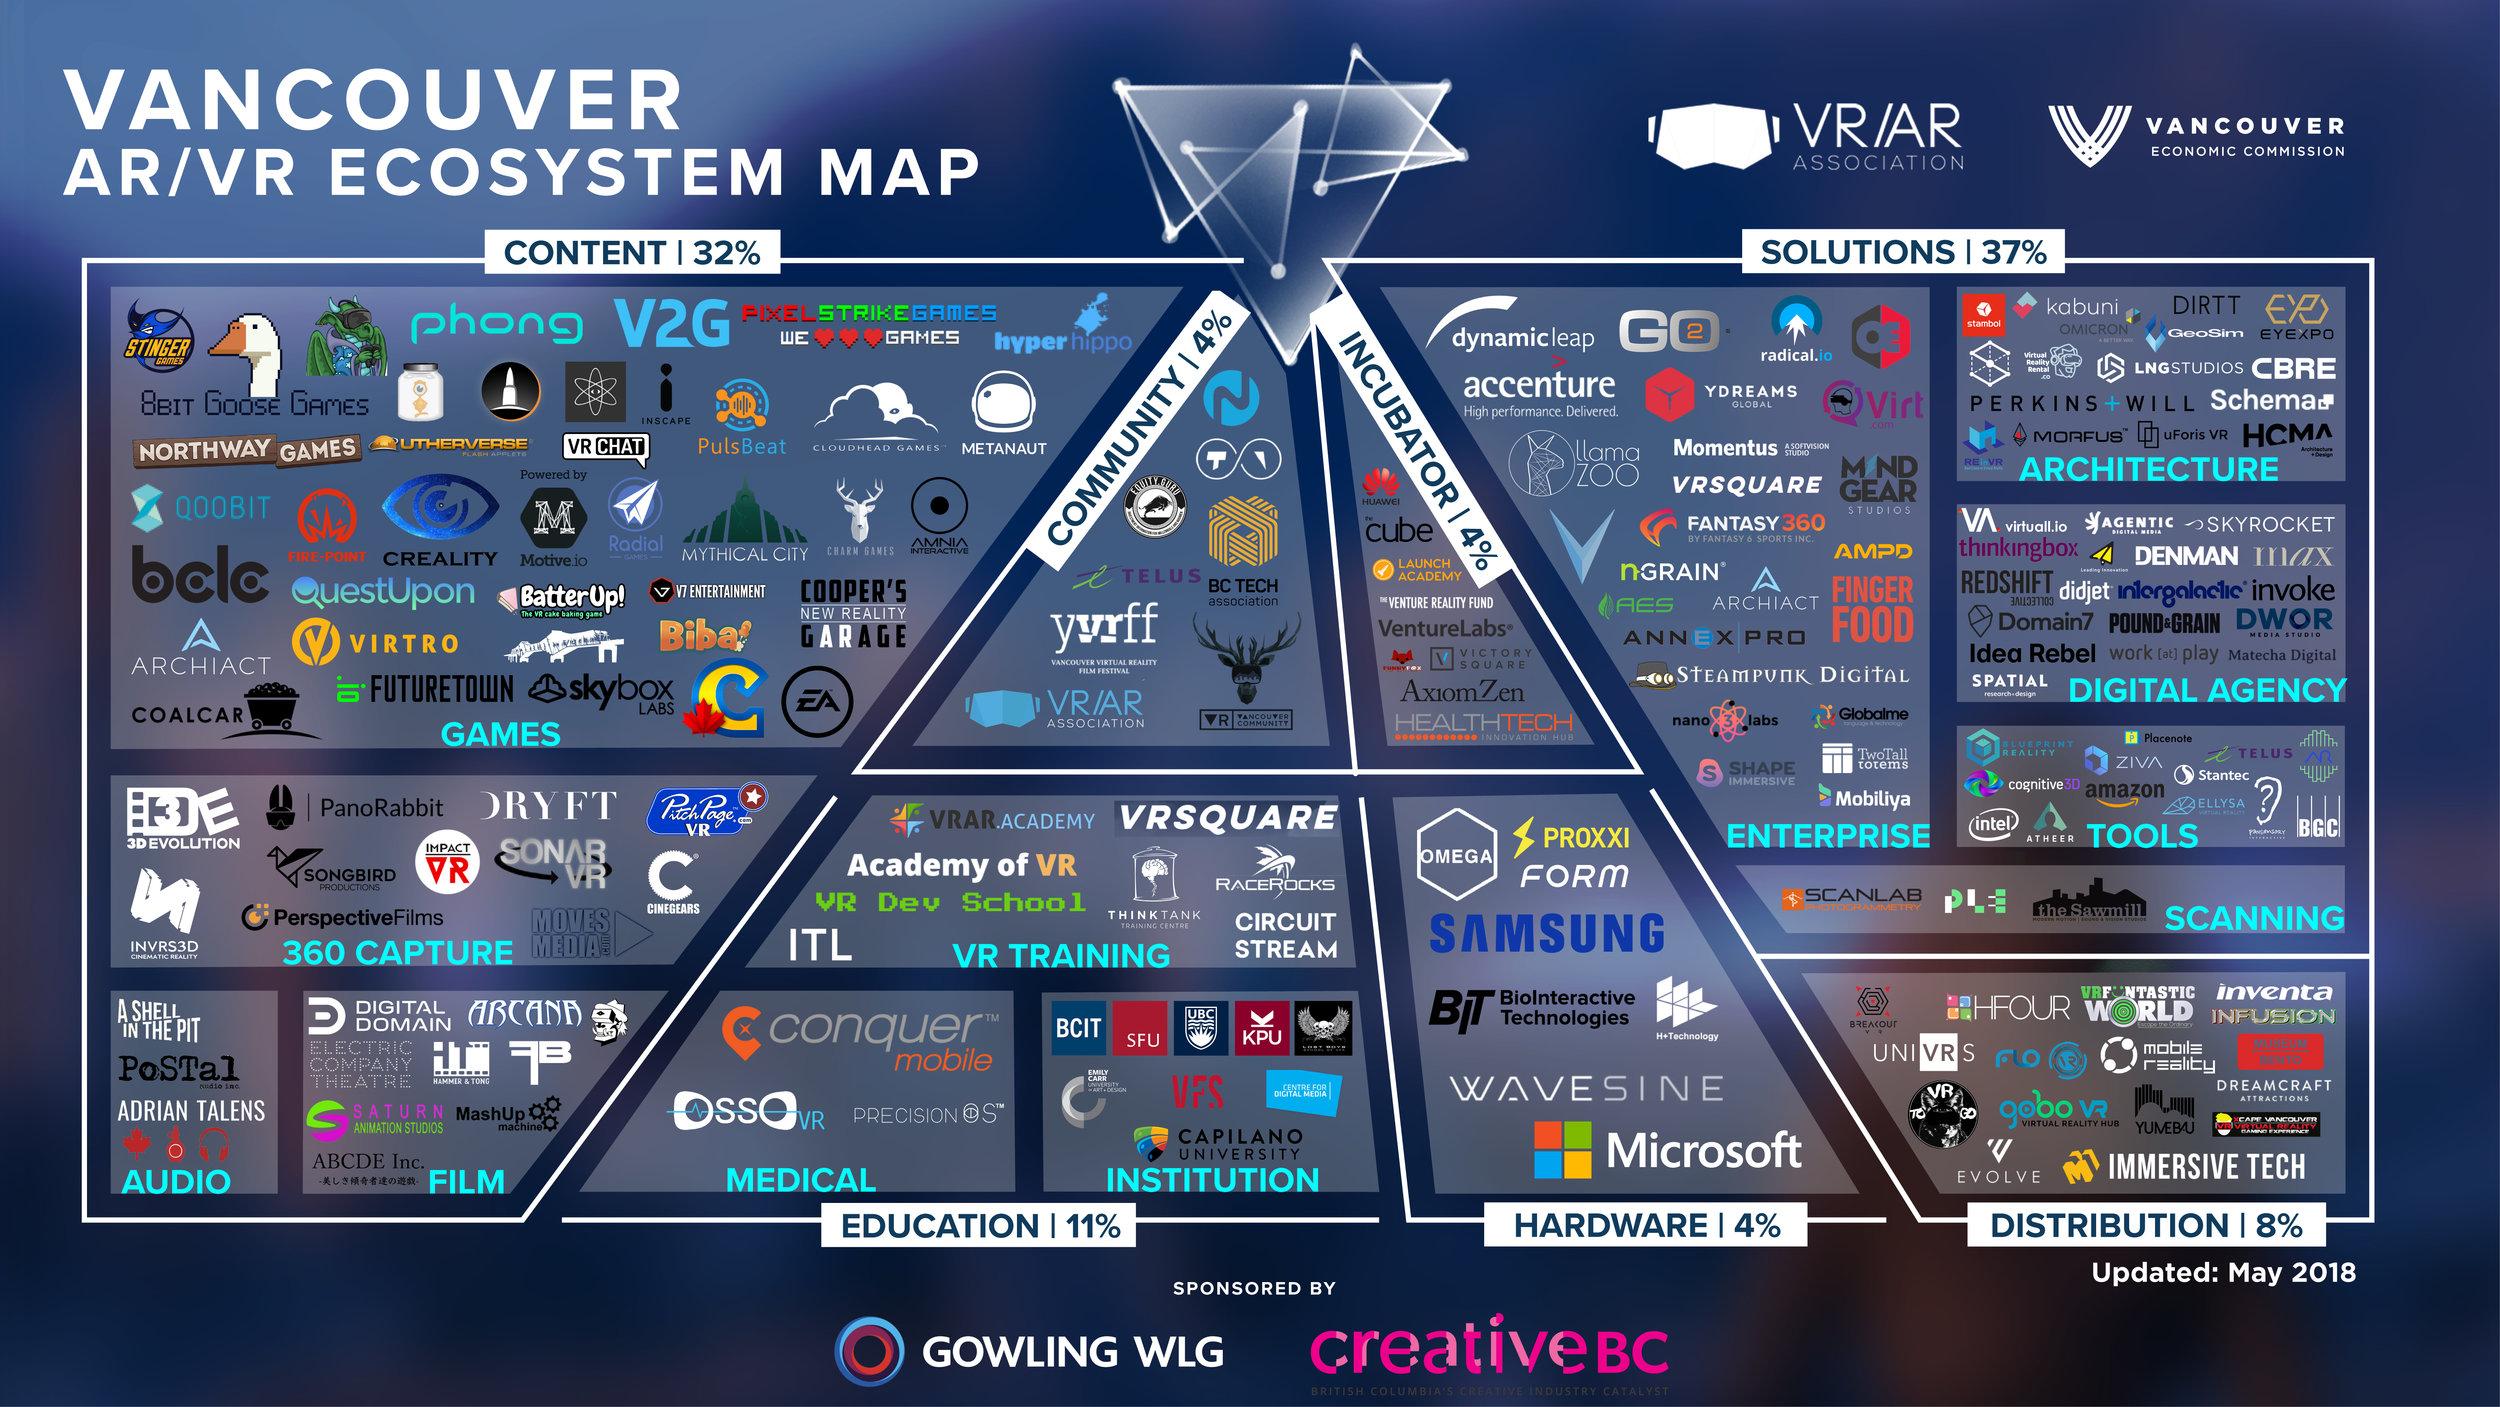 VRARA Vancouver ecosystem.jpg